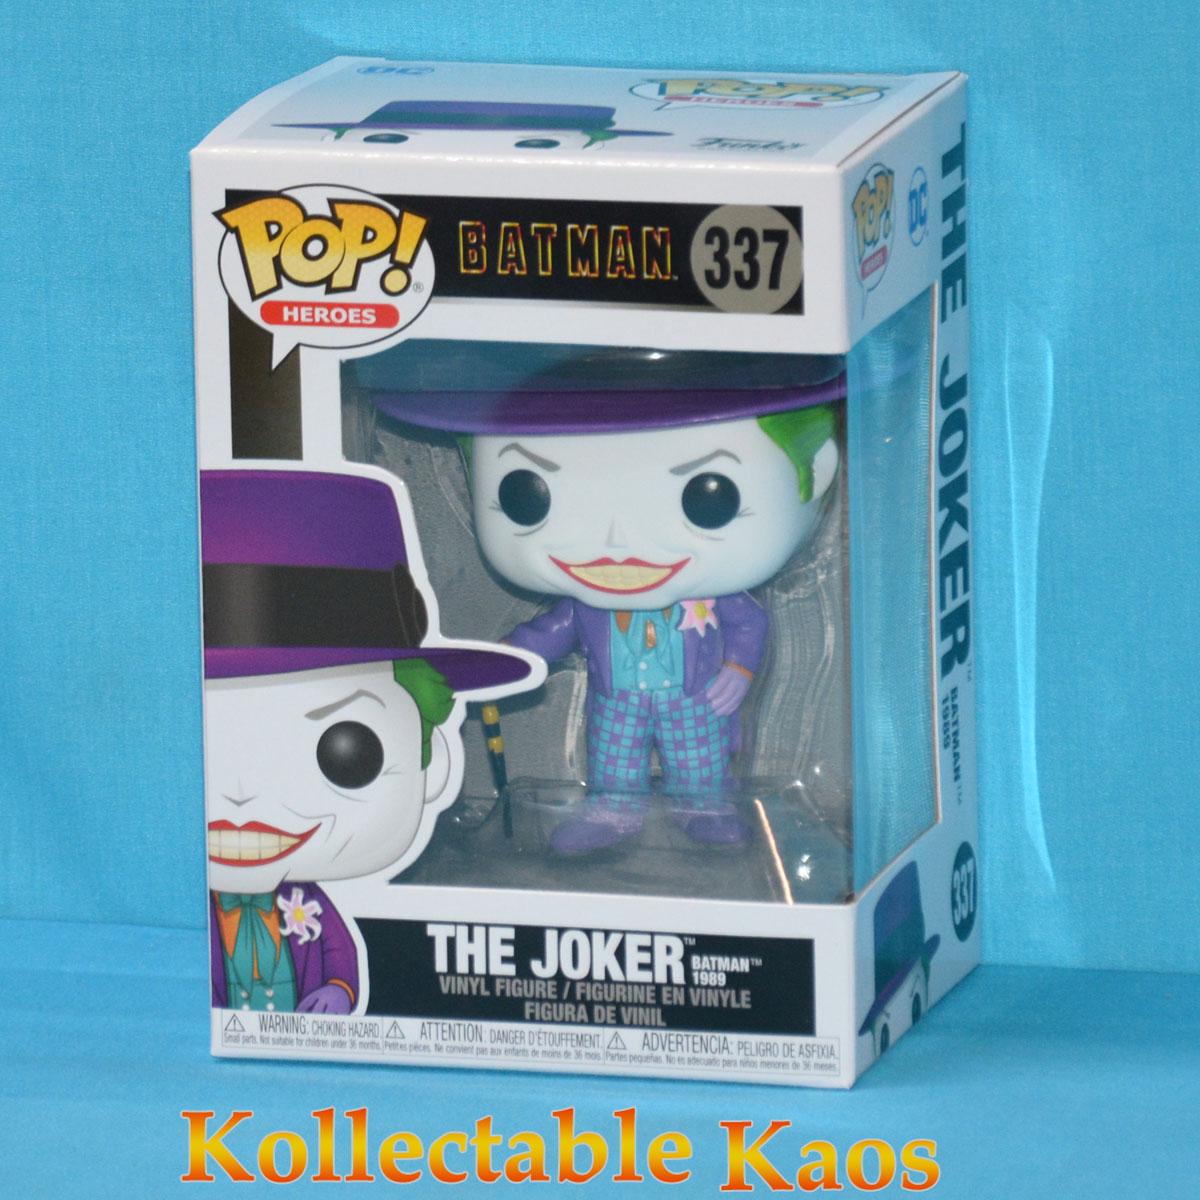 Batman 1989 The Joker Pop Vinyl Figure 337 Kollectable Kaos